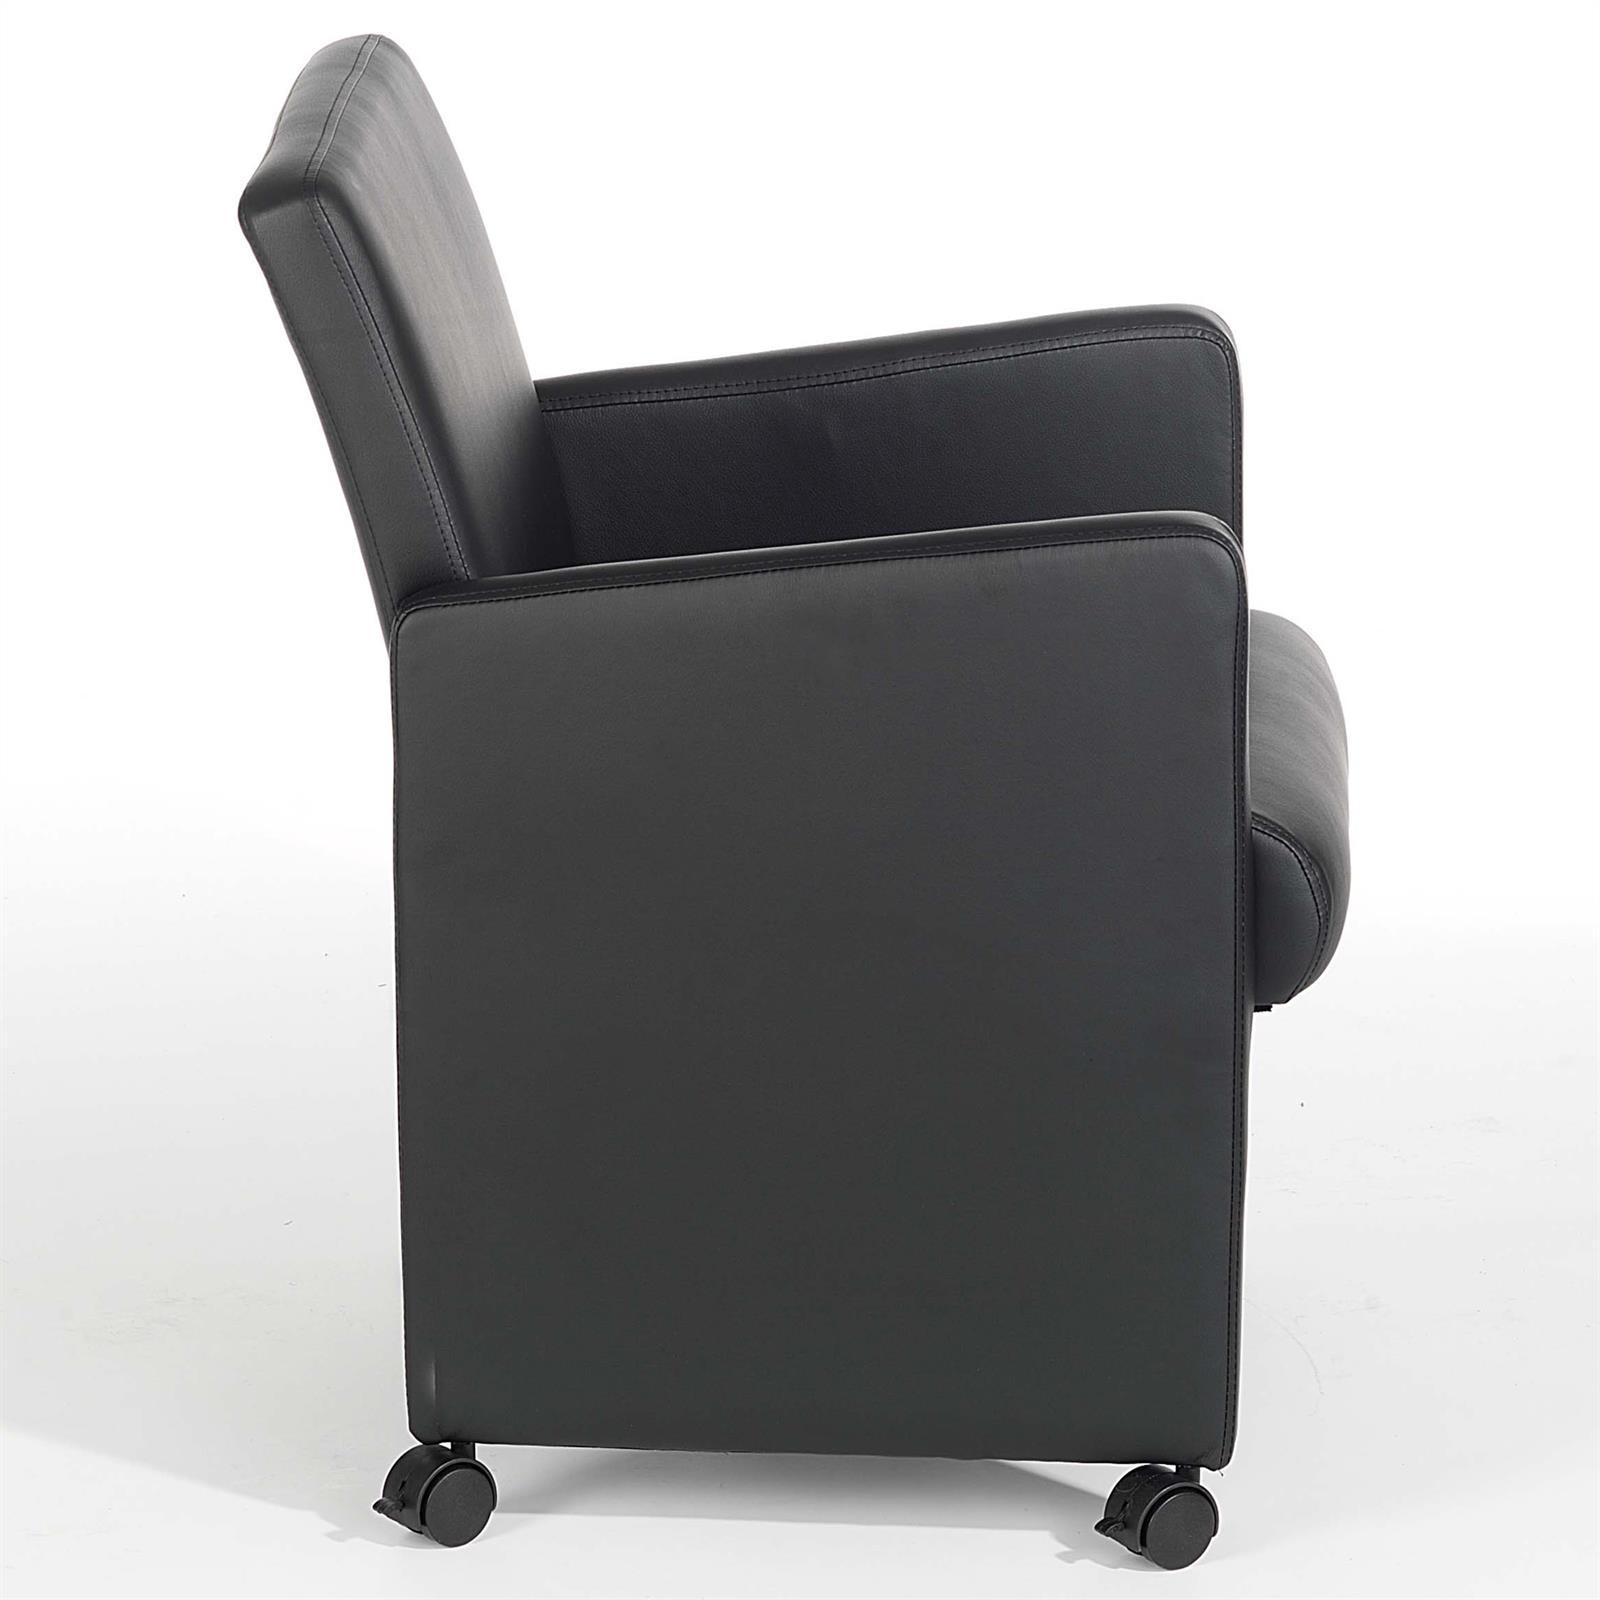 sessel antonia auf rollen in schwarz mobilia24. Black Bedroom Furniture Sets. Home Design Ideas